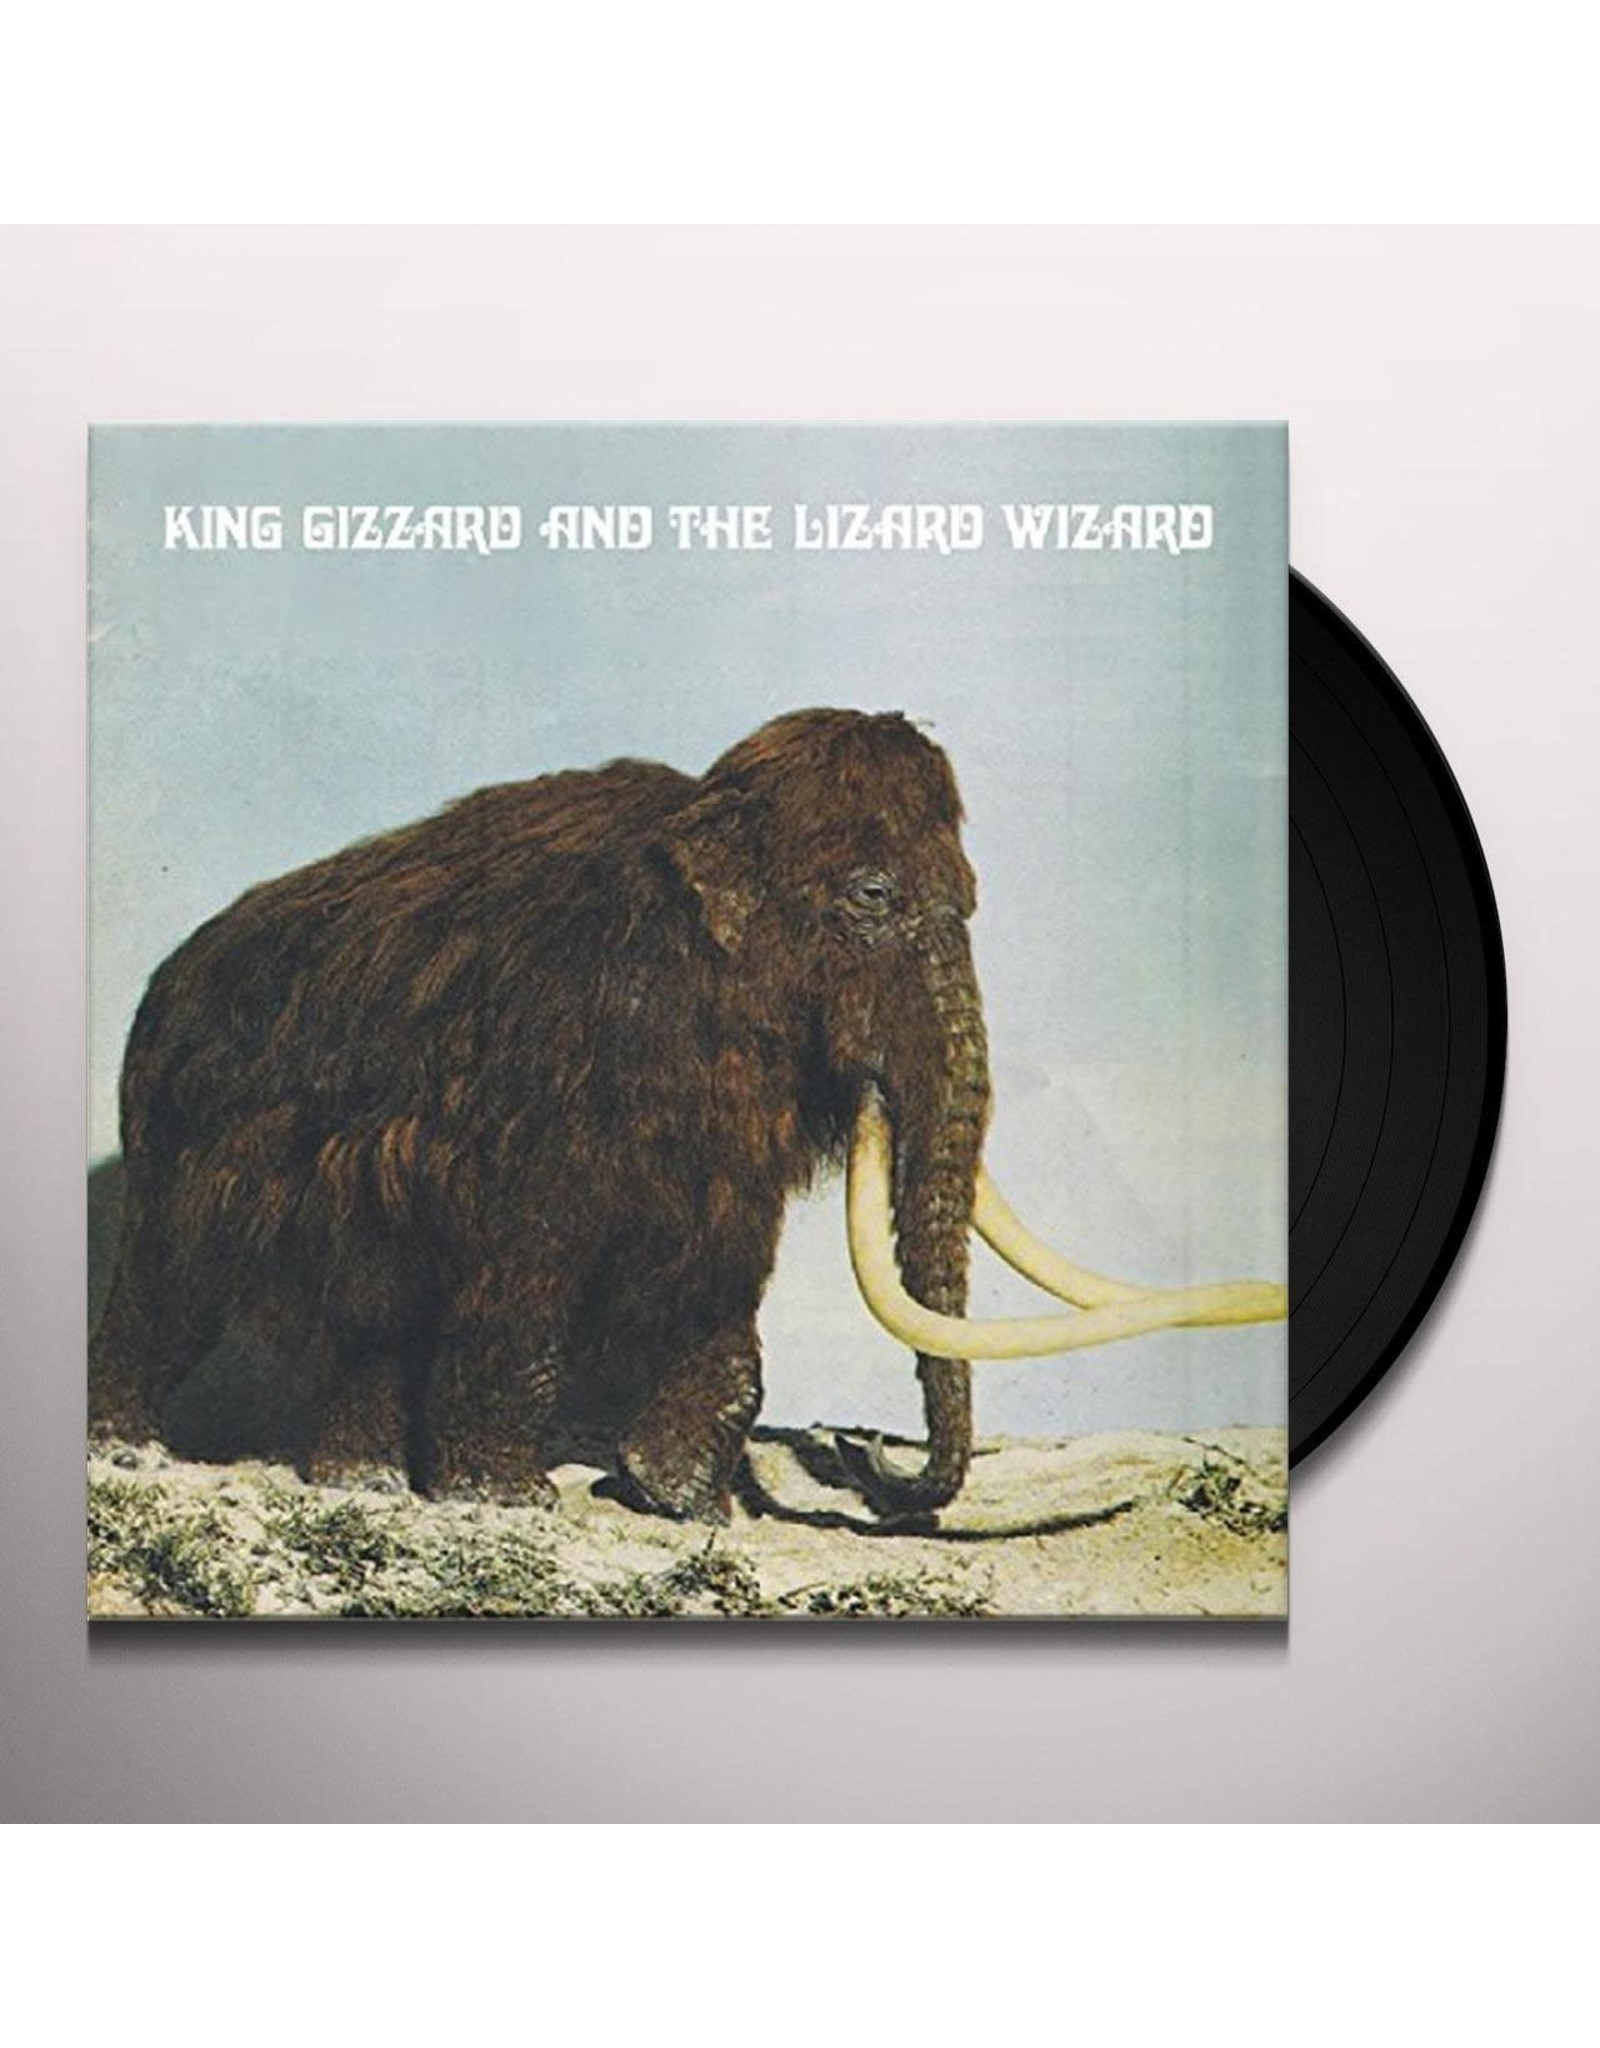 King Gizzard and the Lizard Wizard - Polygondwanaland (Fuzz Club version) (180g-blue vinyl) LP